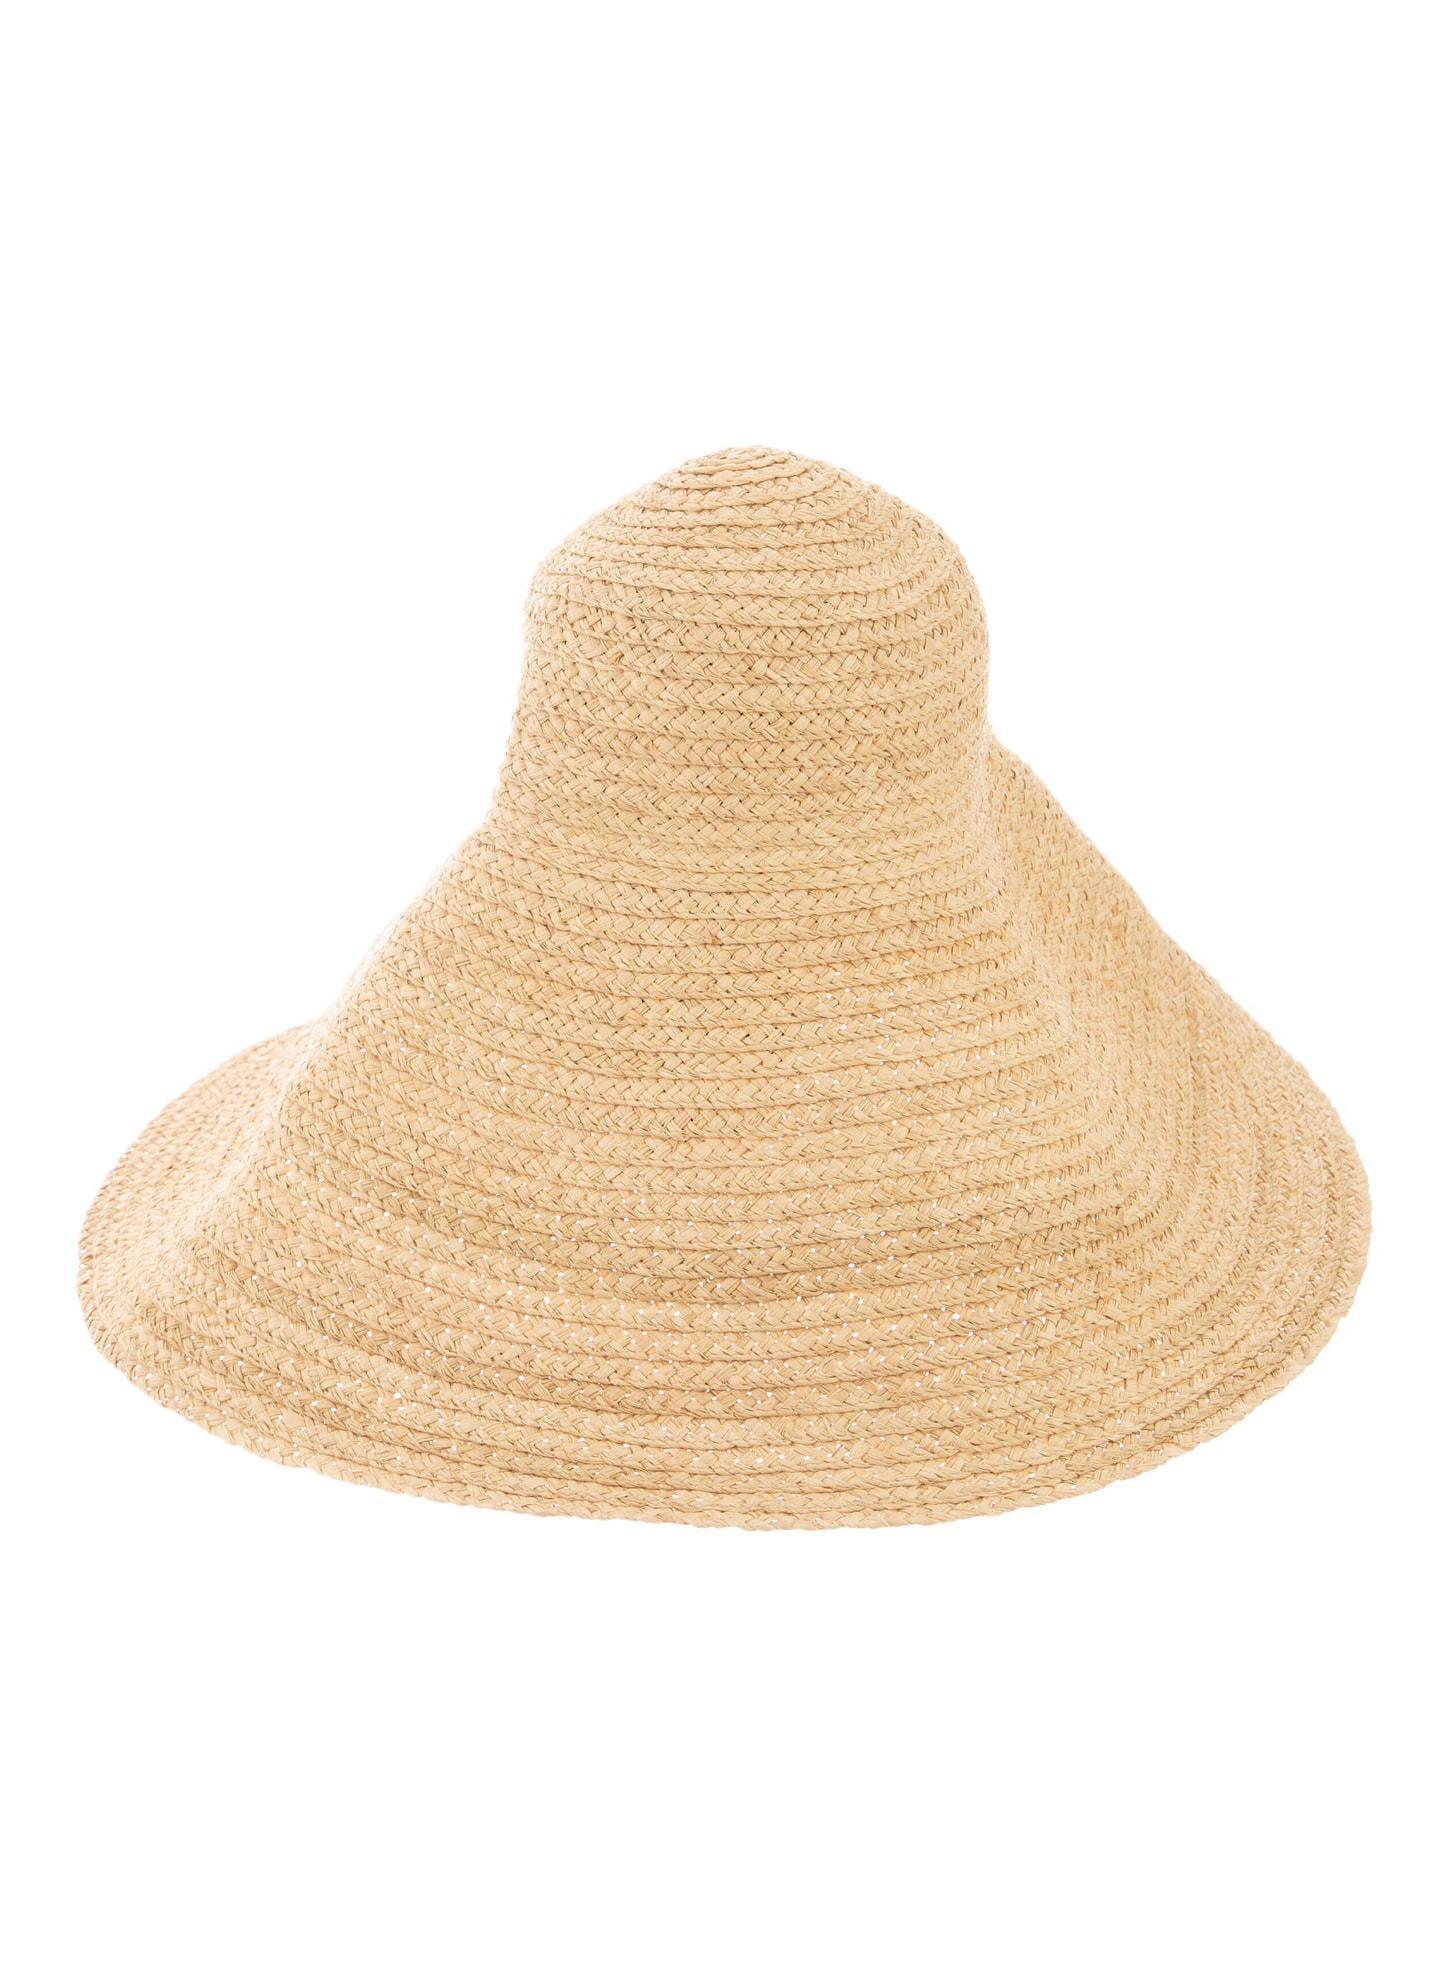 JACQUEMUS Wide-Brimmed Sun Hat